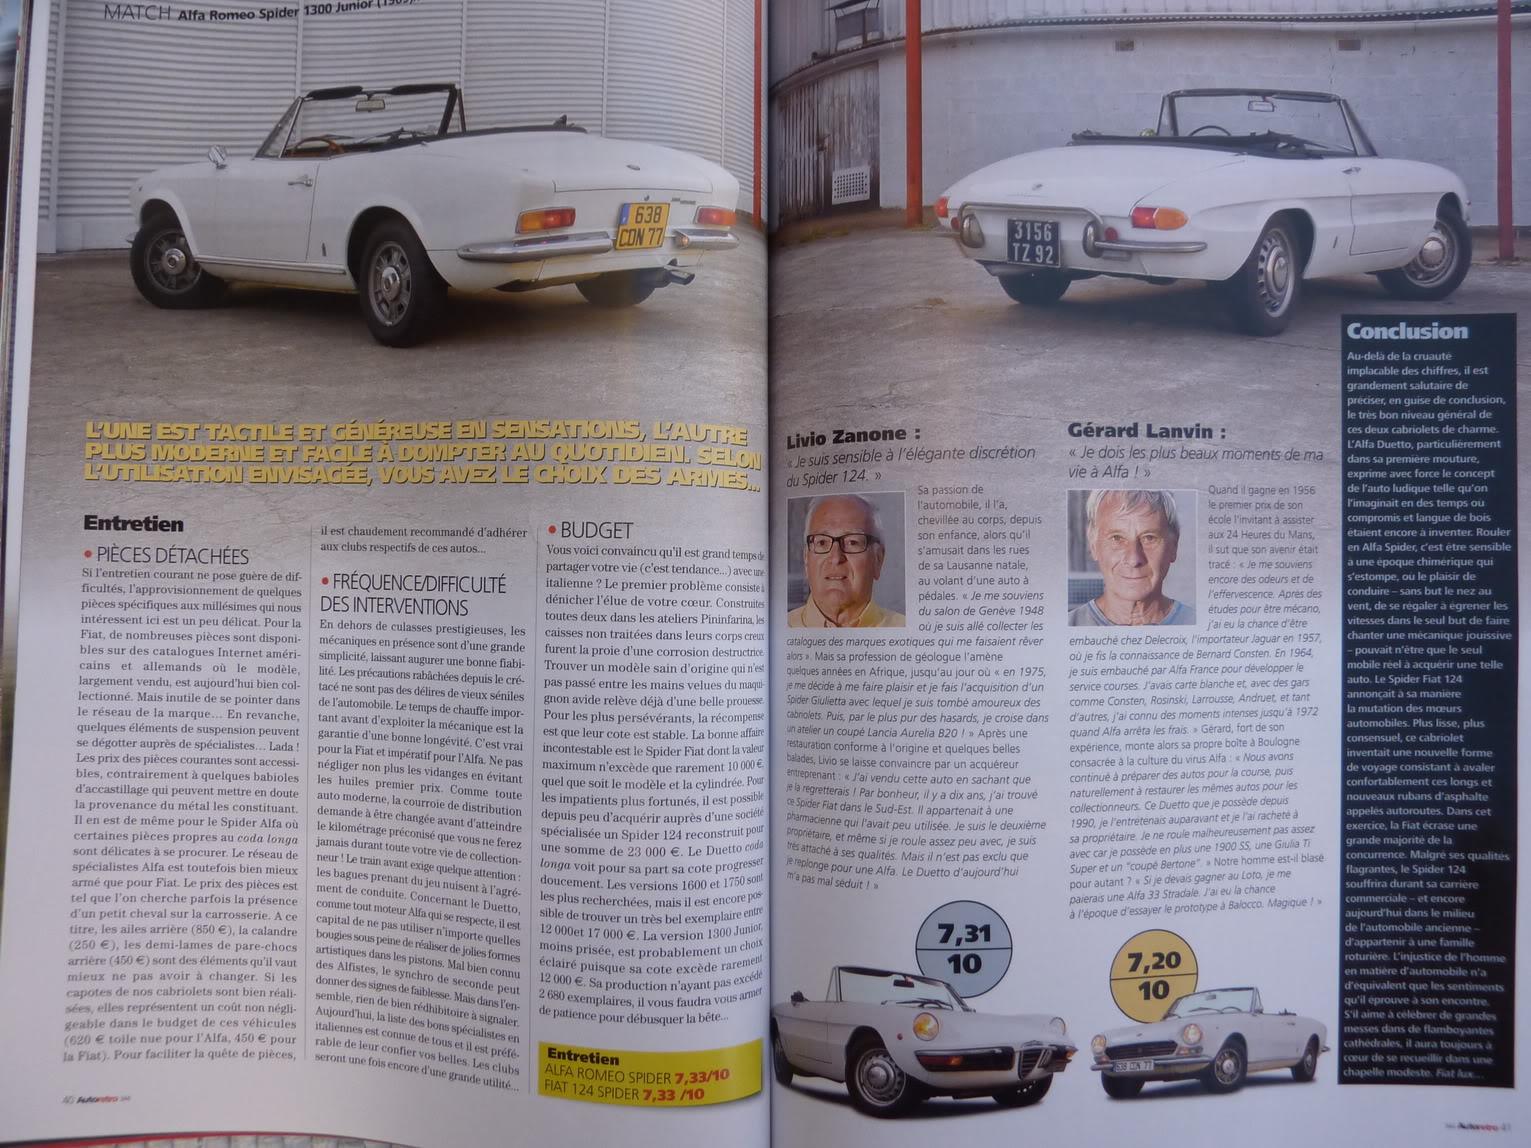 [ FOTOS ] Alfa Romeo Spider vs/ Fiat 124 Spider - Primos hermanos del 306 Cabrio P1060923